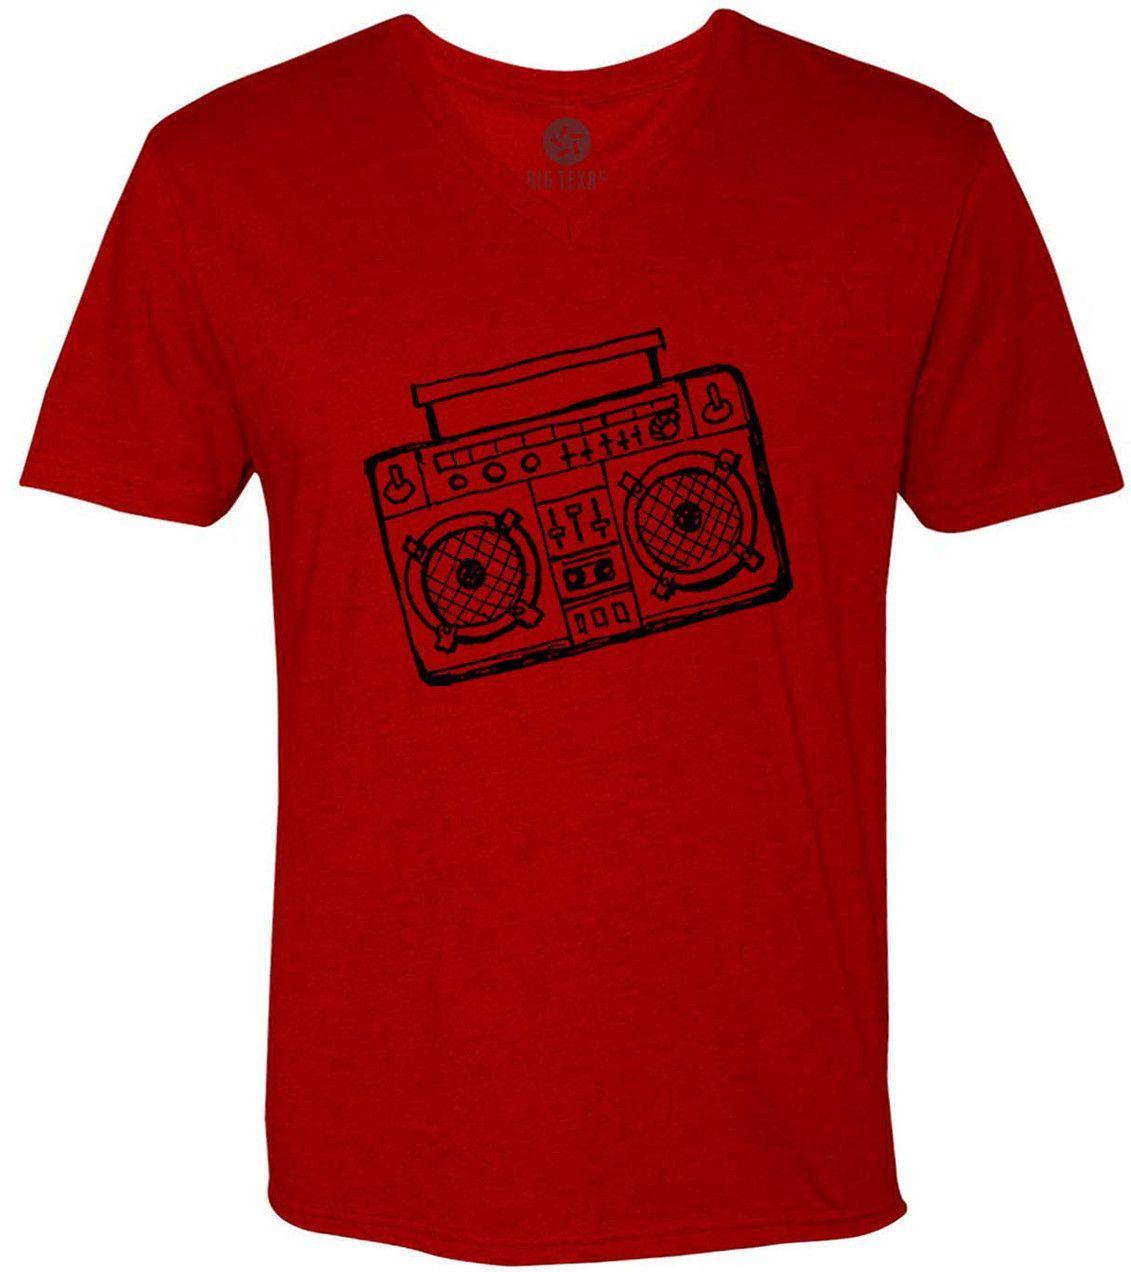 Boom Box Drawing (Black) Short-Sleeve V-Neck T-Shirt